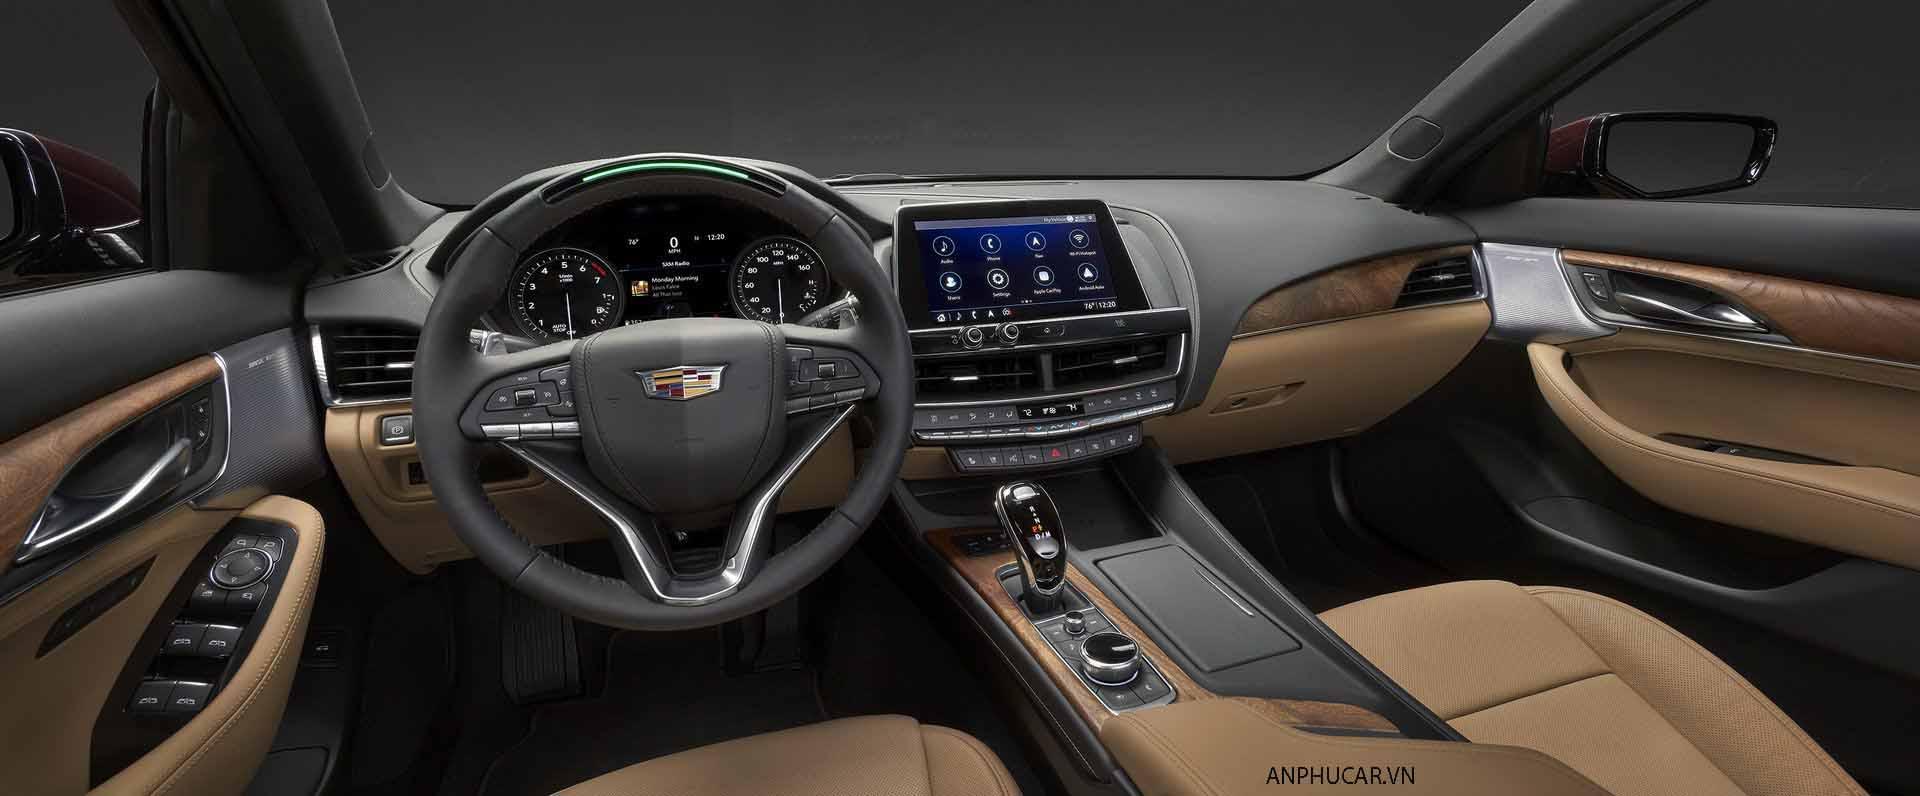 Nội thất xe Cadillac CT5 2020